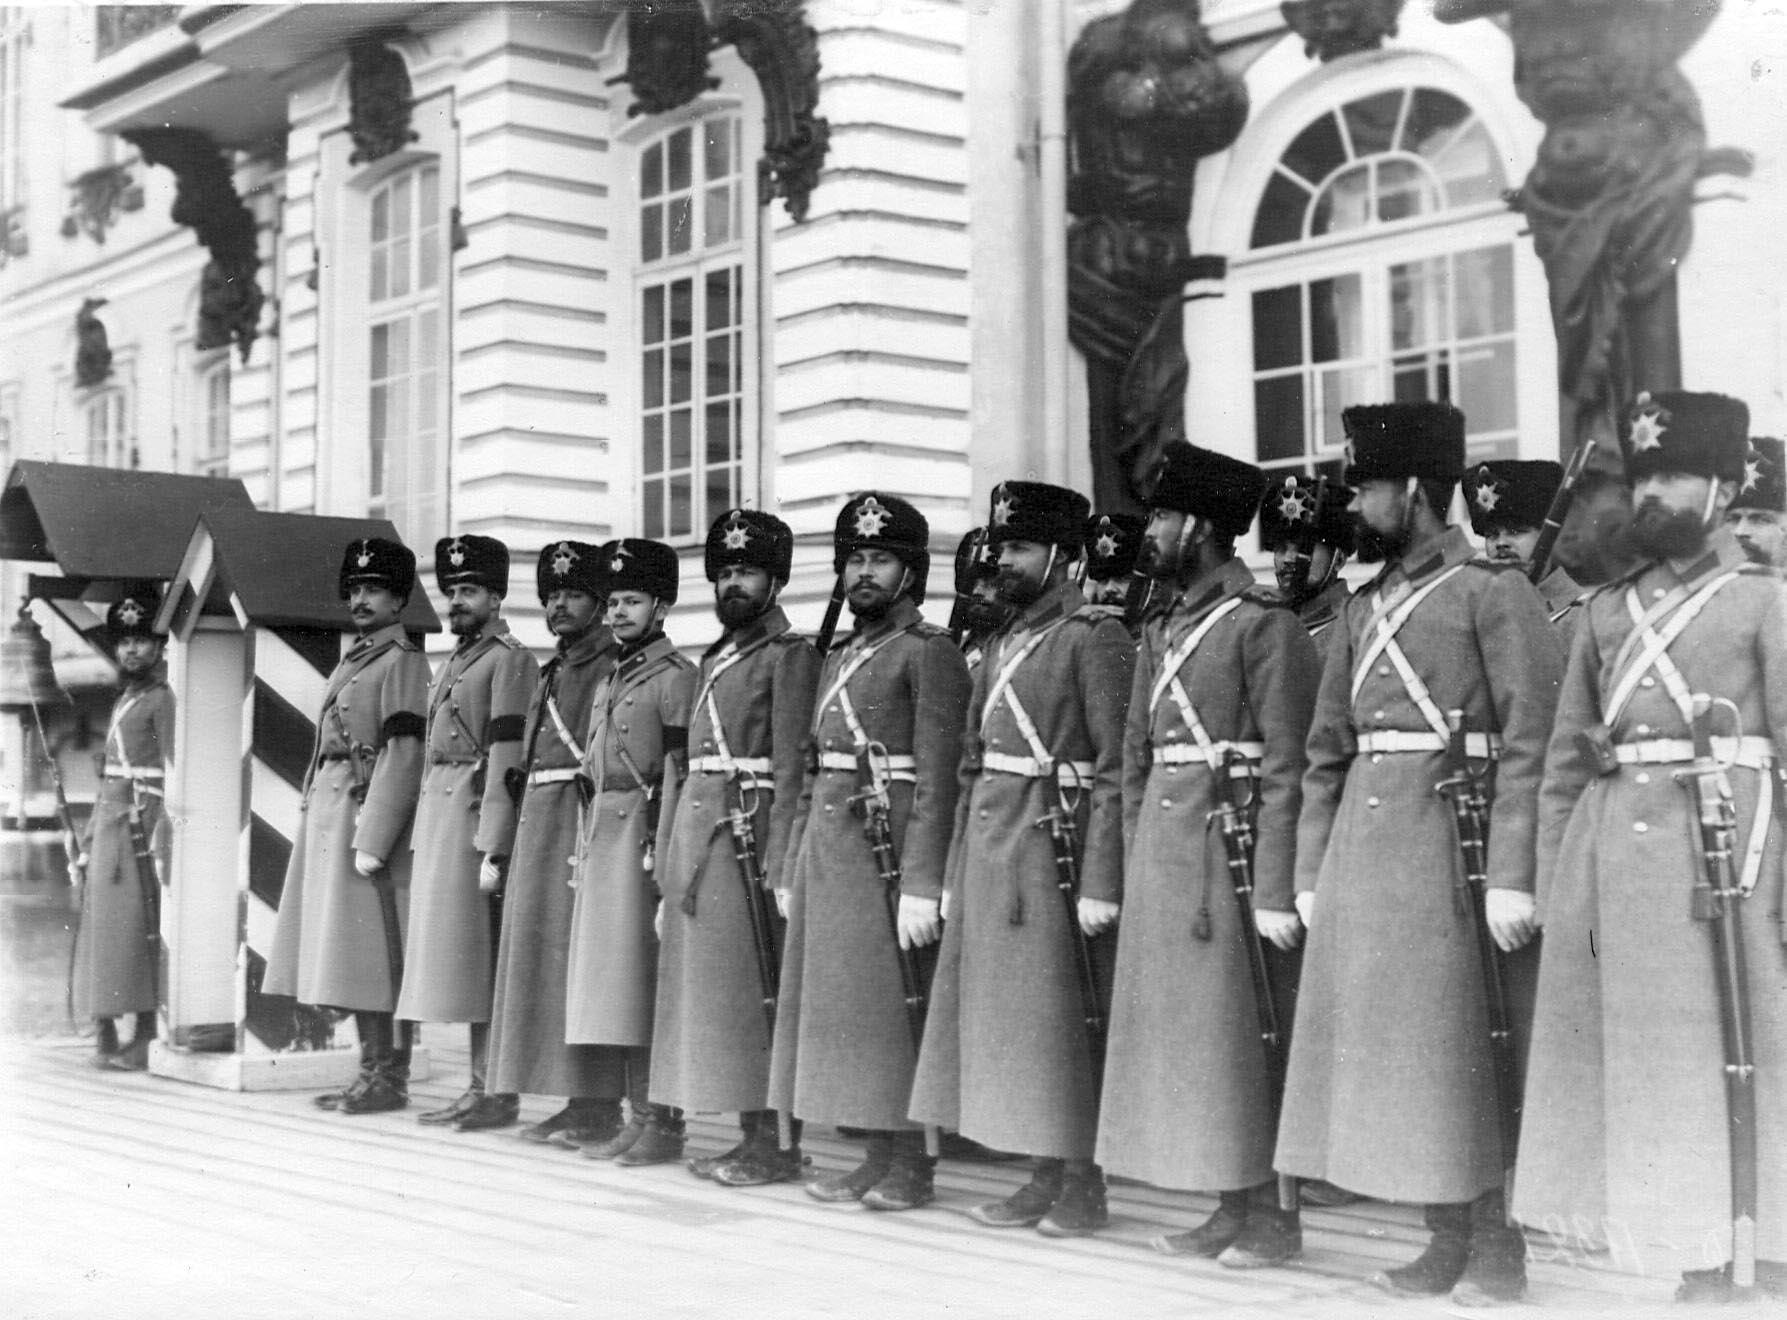 1905. Караул гусар у здания Екатерининского дворца. 21 апреля